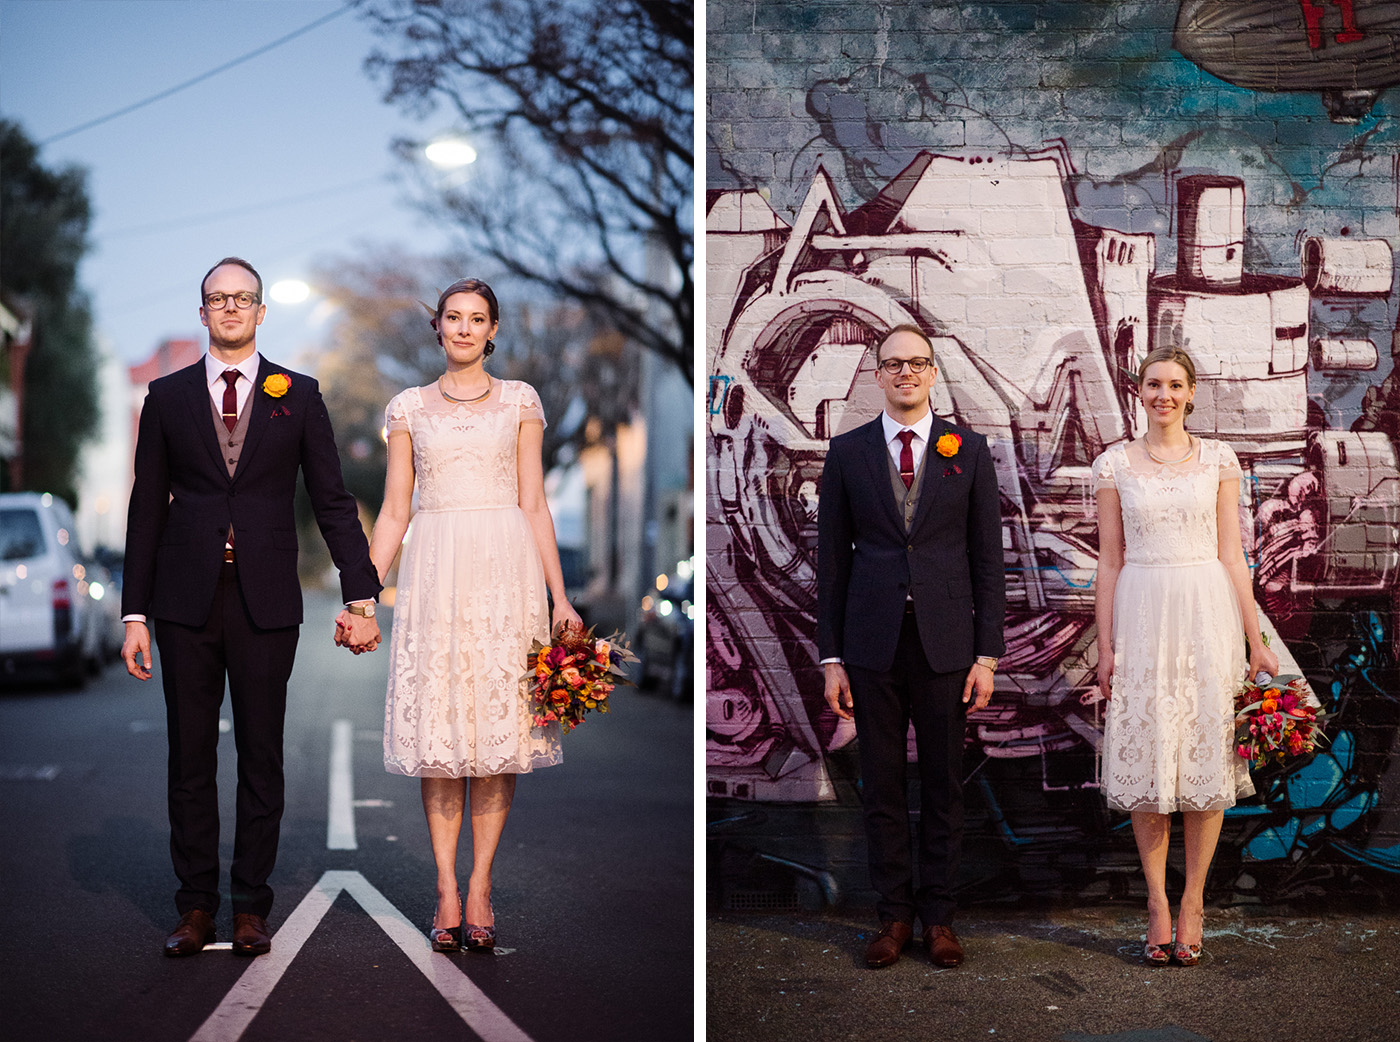 Fitzroy-townhall-wedding-photos-160